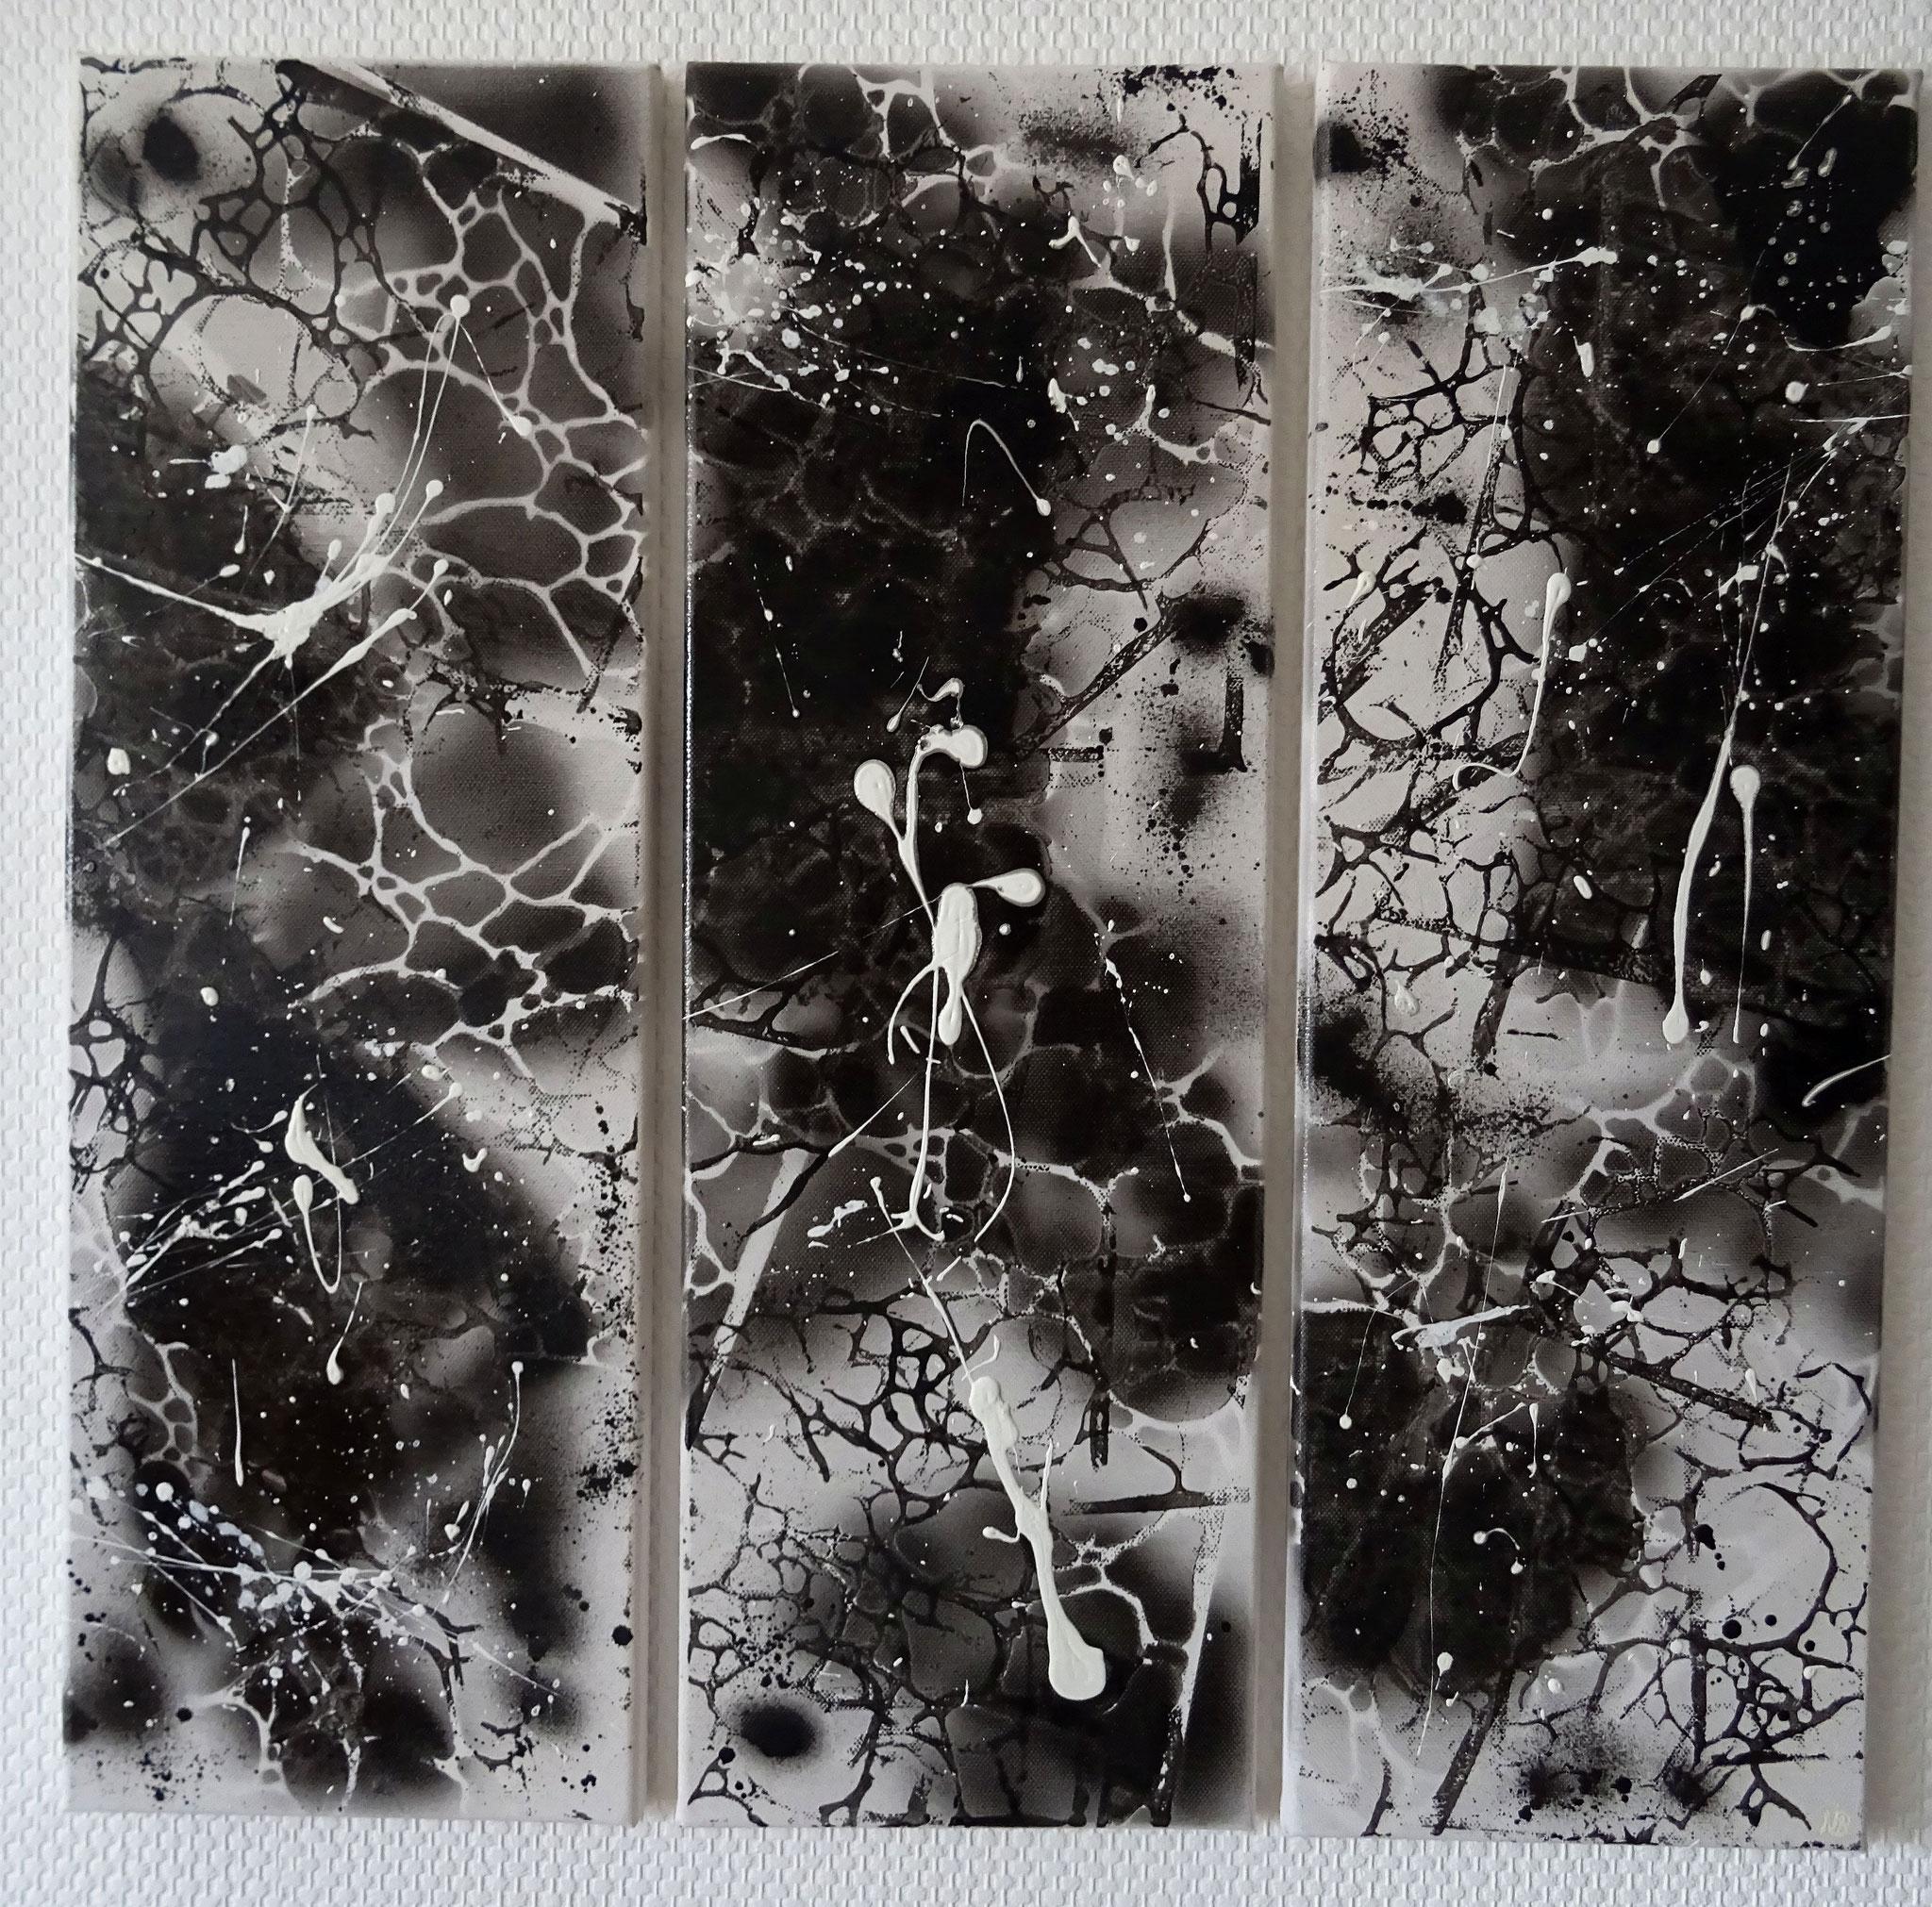 Black and White (20x60x1,5 - dreiteilig)